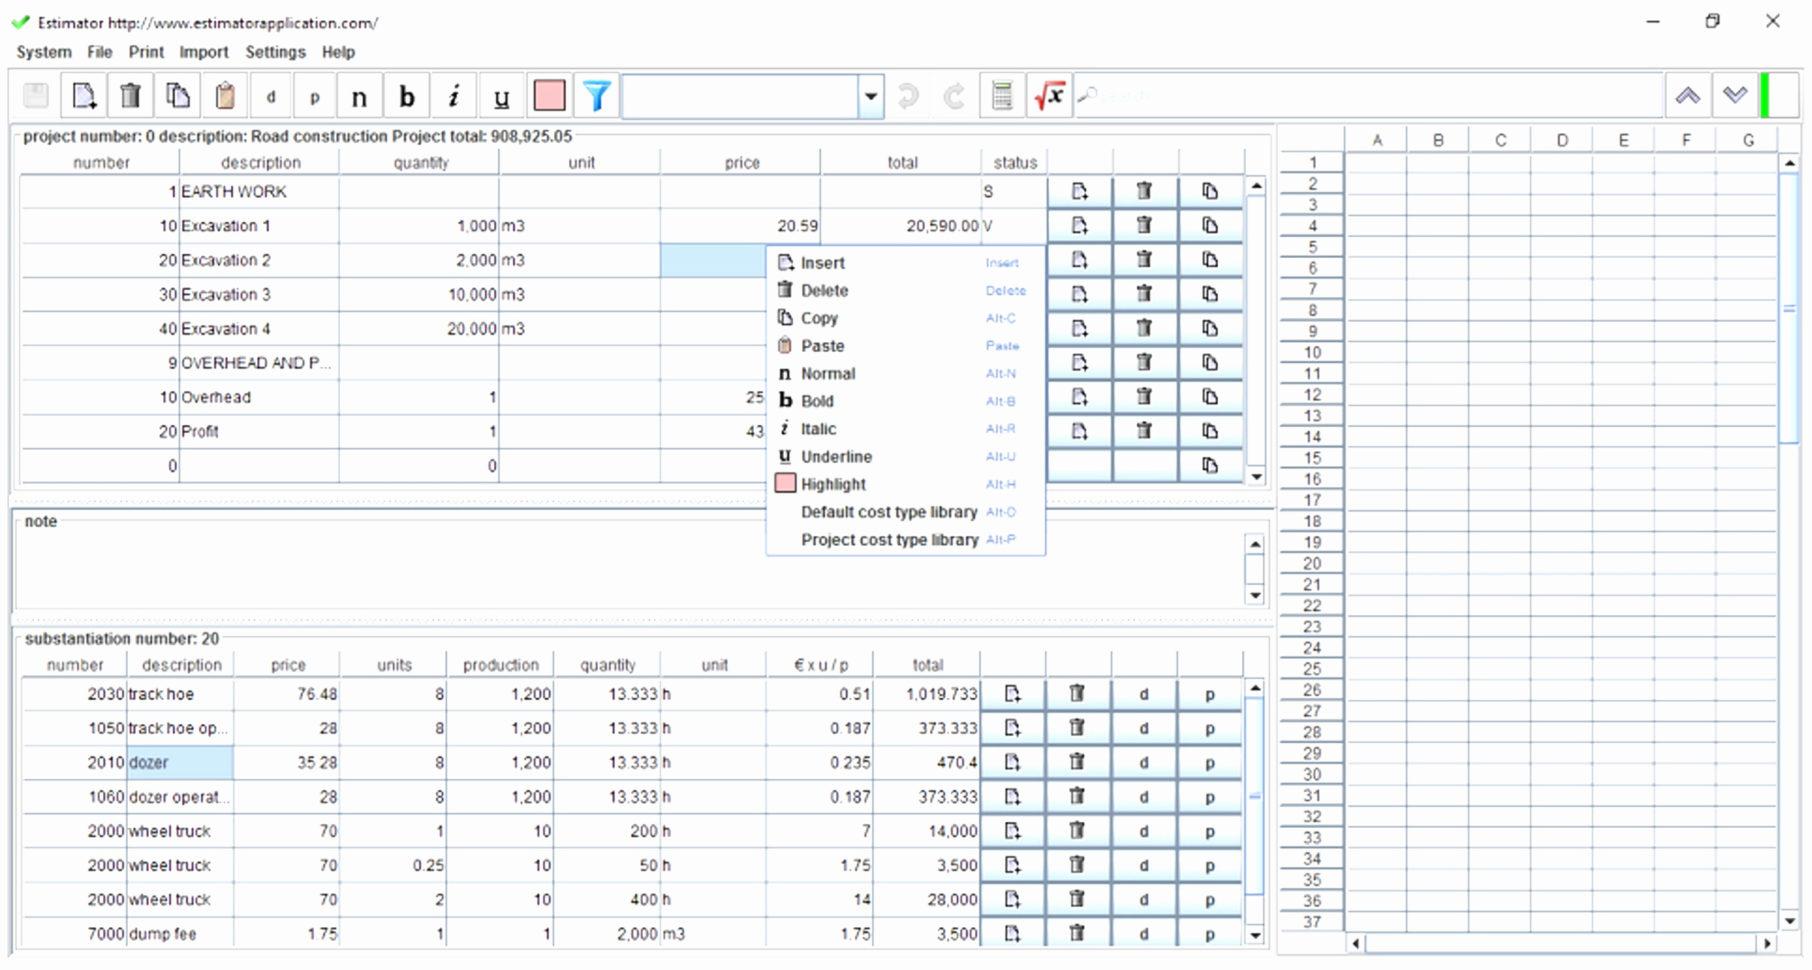 Social Security Benefit Calculator Excel Spreadsheet With Regard To New Social Security Benefit Calculator Excel Spreadsheet Fresh